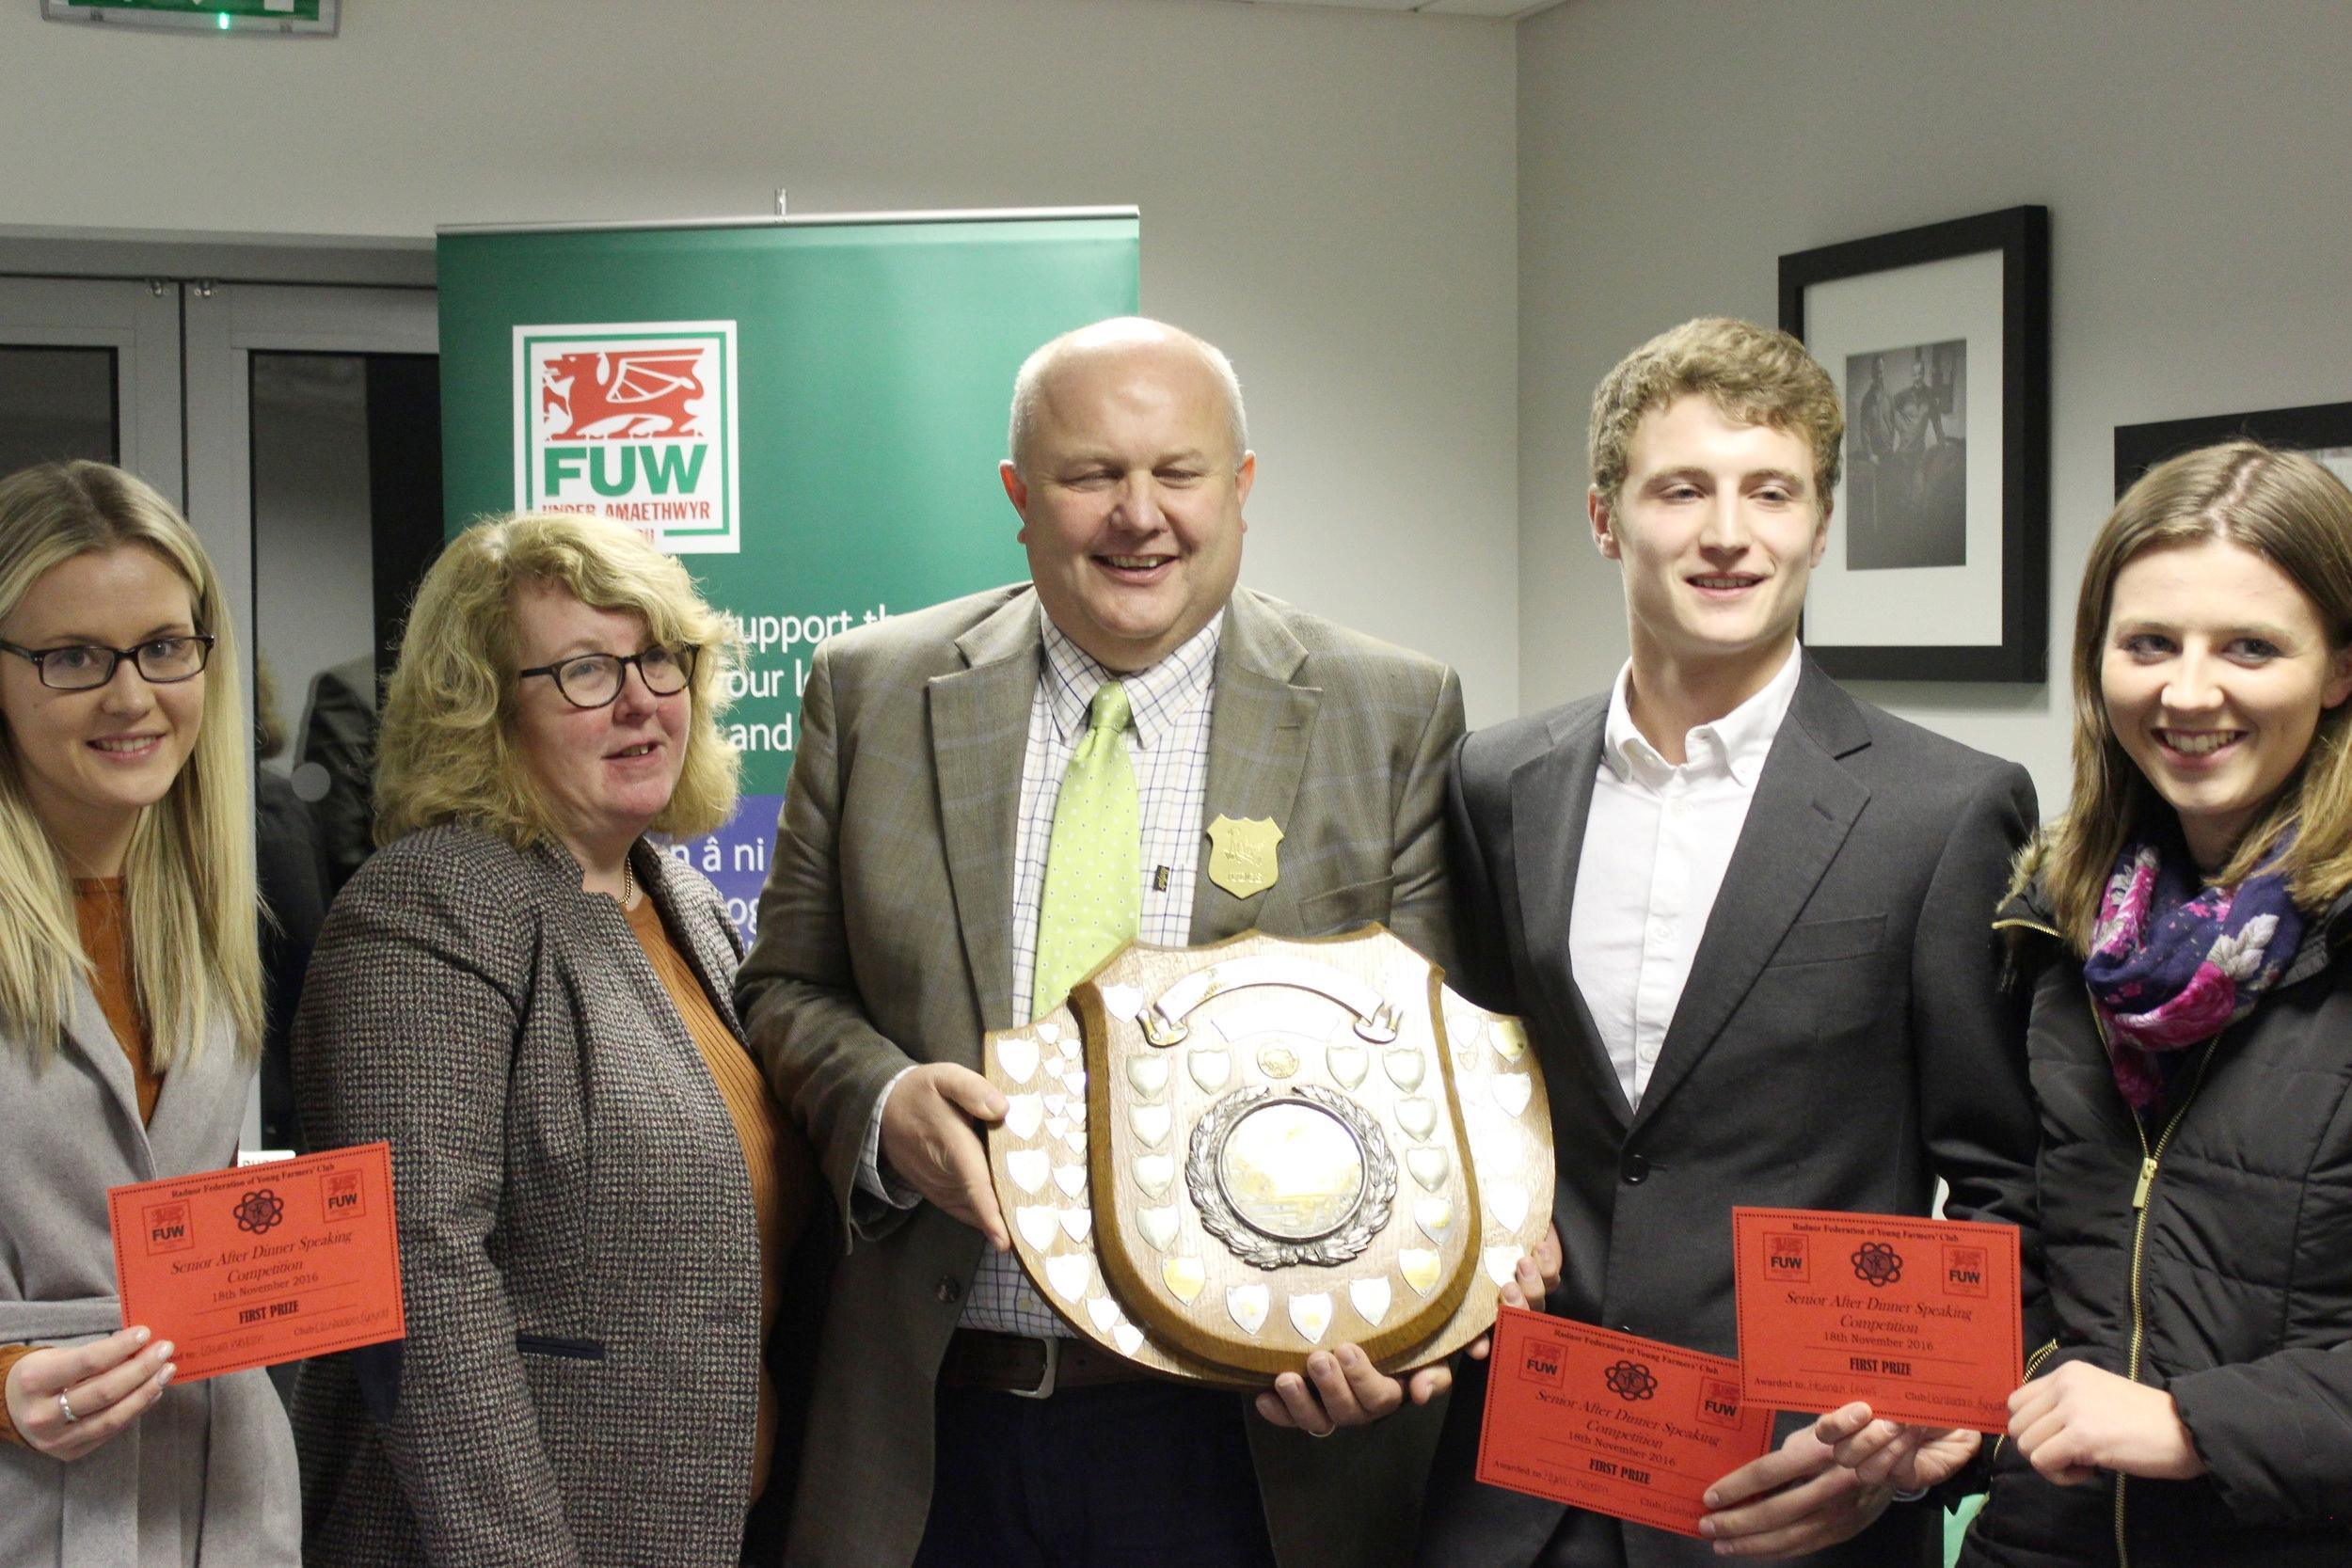 Winners of the Senior After Dinner Speaking Laura Watson, Hywel Watson & Hannah Lewis Llanbadarn Fynydd YFC with judges Stuart & Karen Anthony.